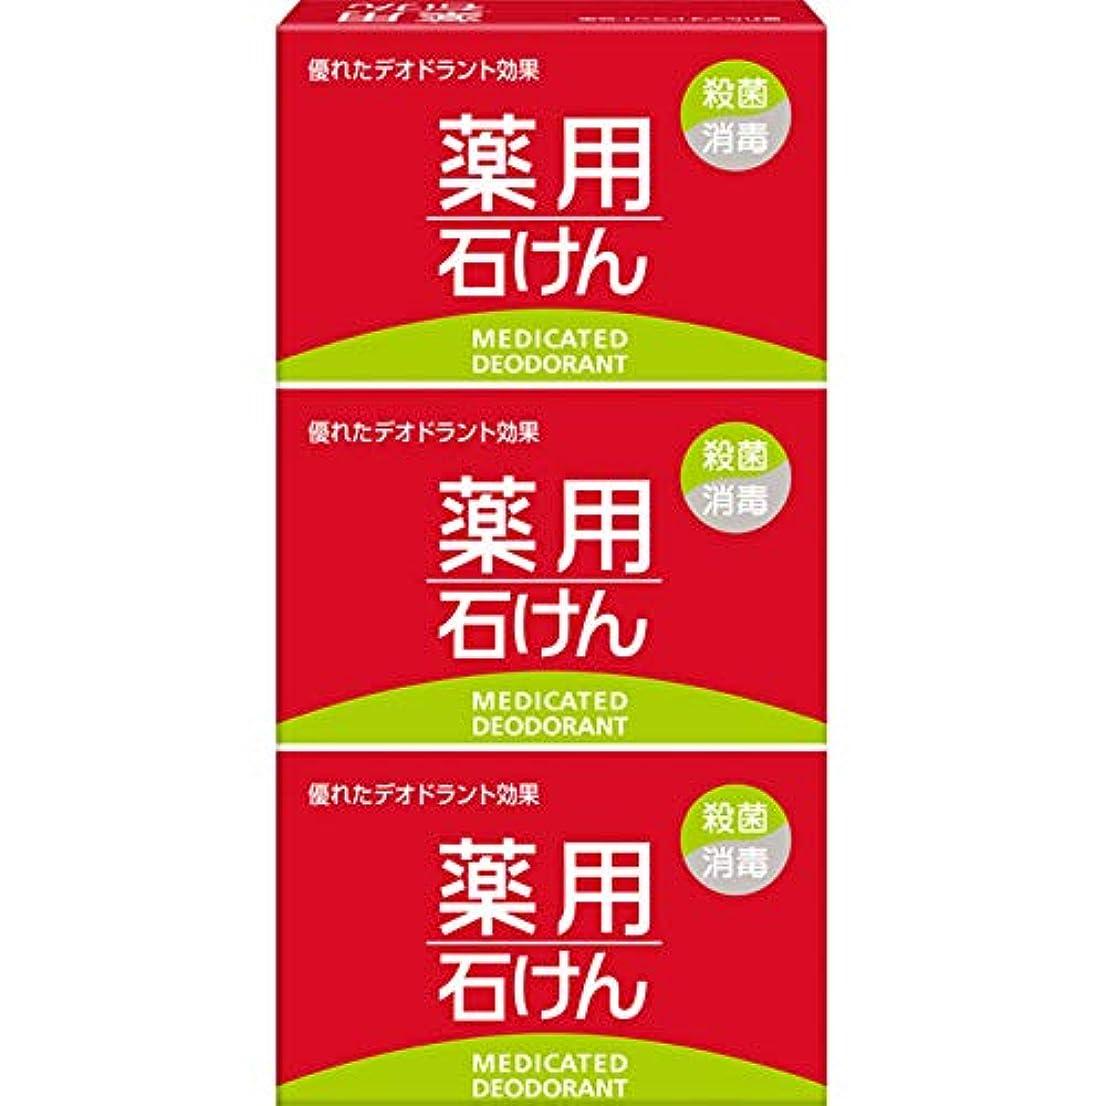 MK 薬用石けん 100g×3個 (医薬部外品)